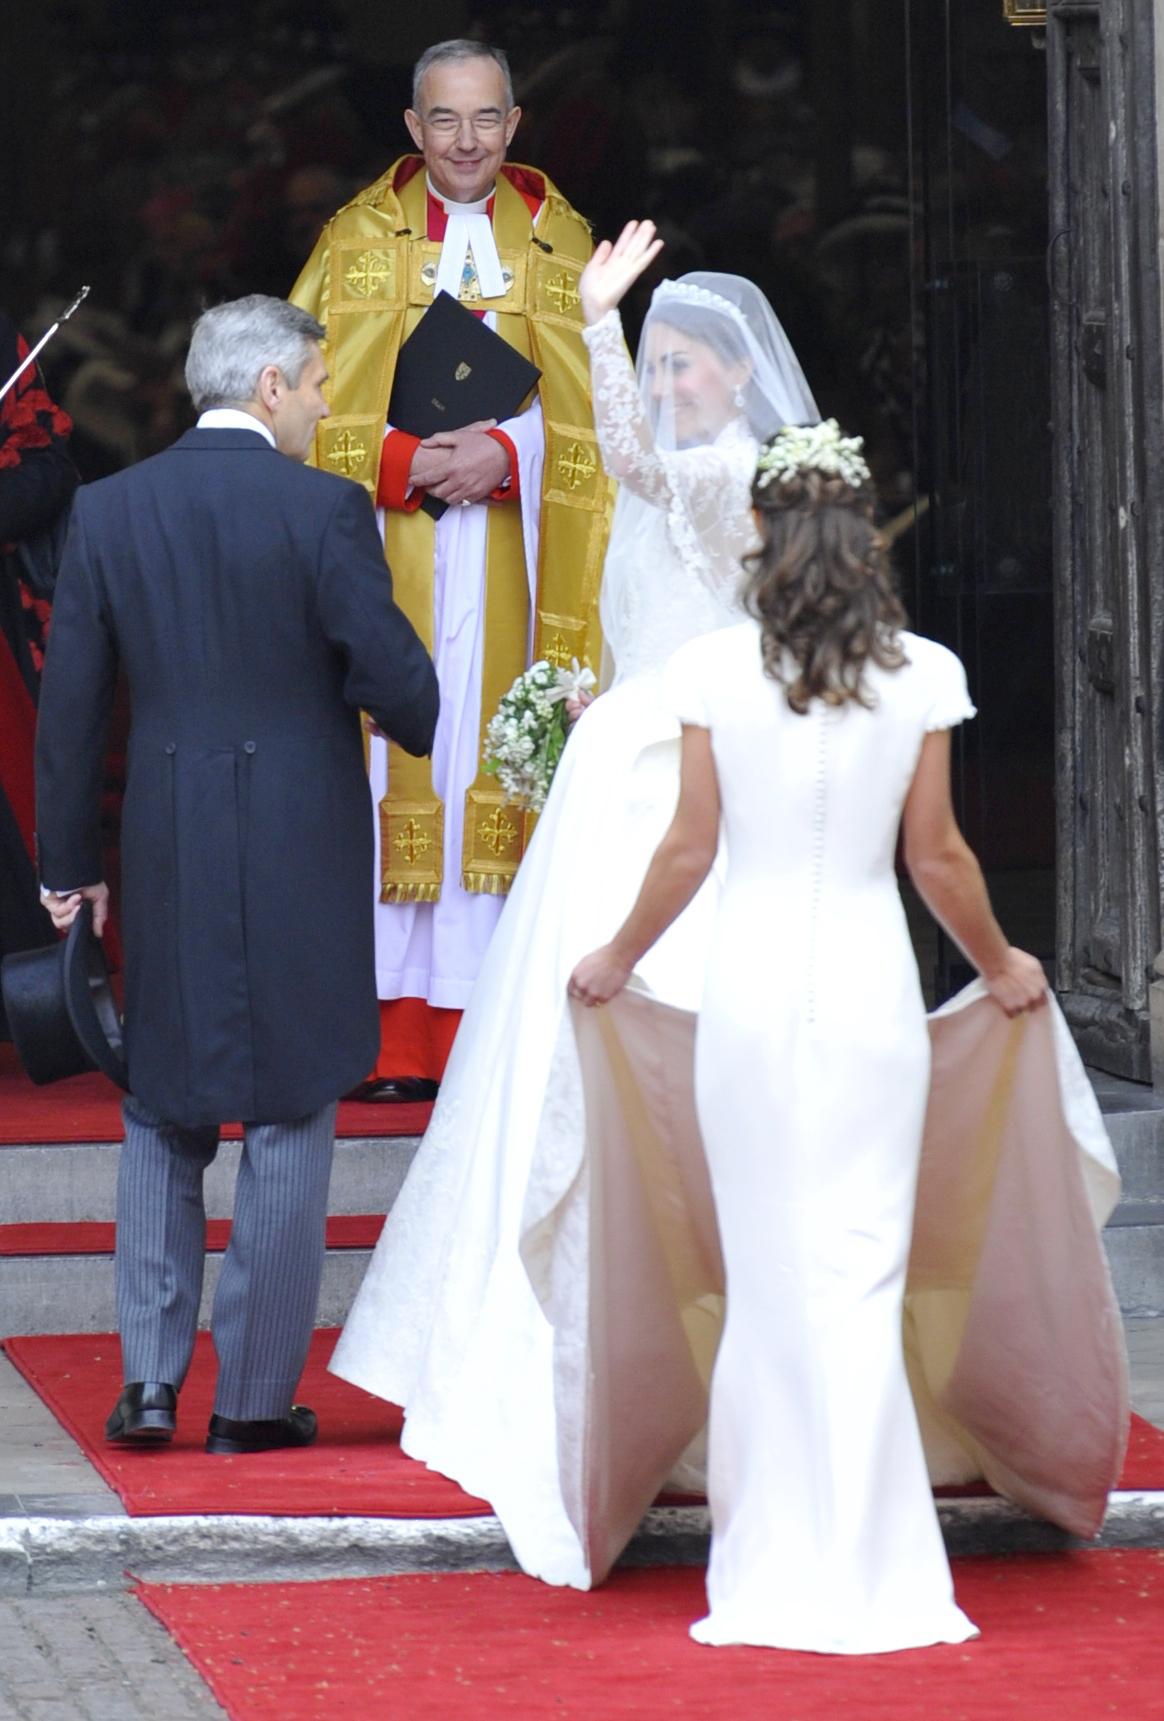 Pippa middleton 39 s famous bottom kate 39 s sister insists for Kate middleton wedding pippa dress